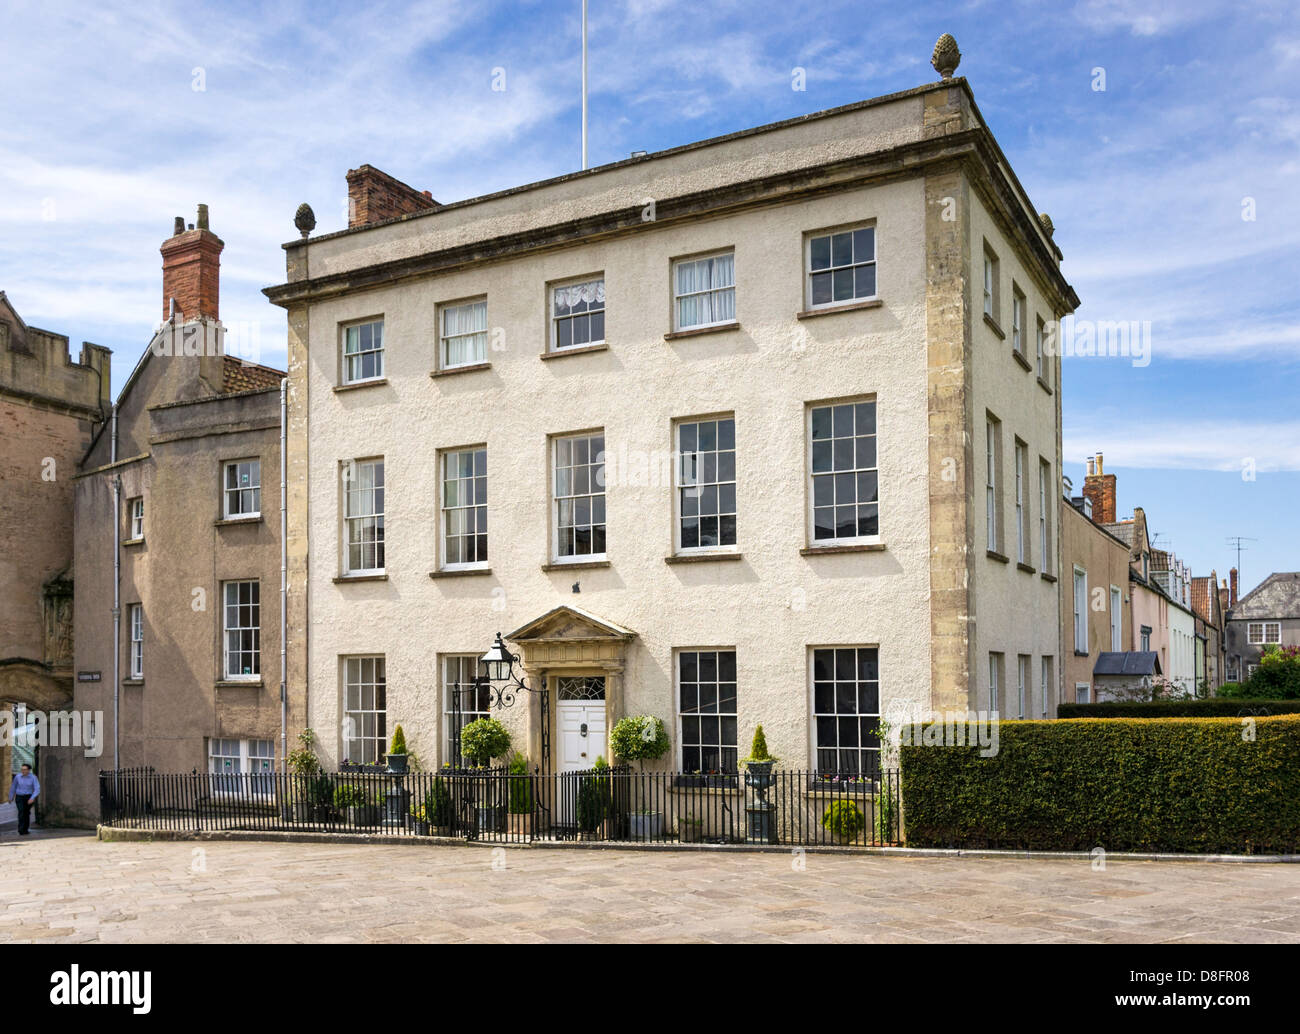 Georgian townhouse / house UK in Wells, Somerset, England - Stock Image